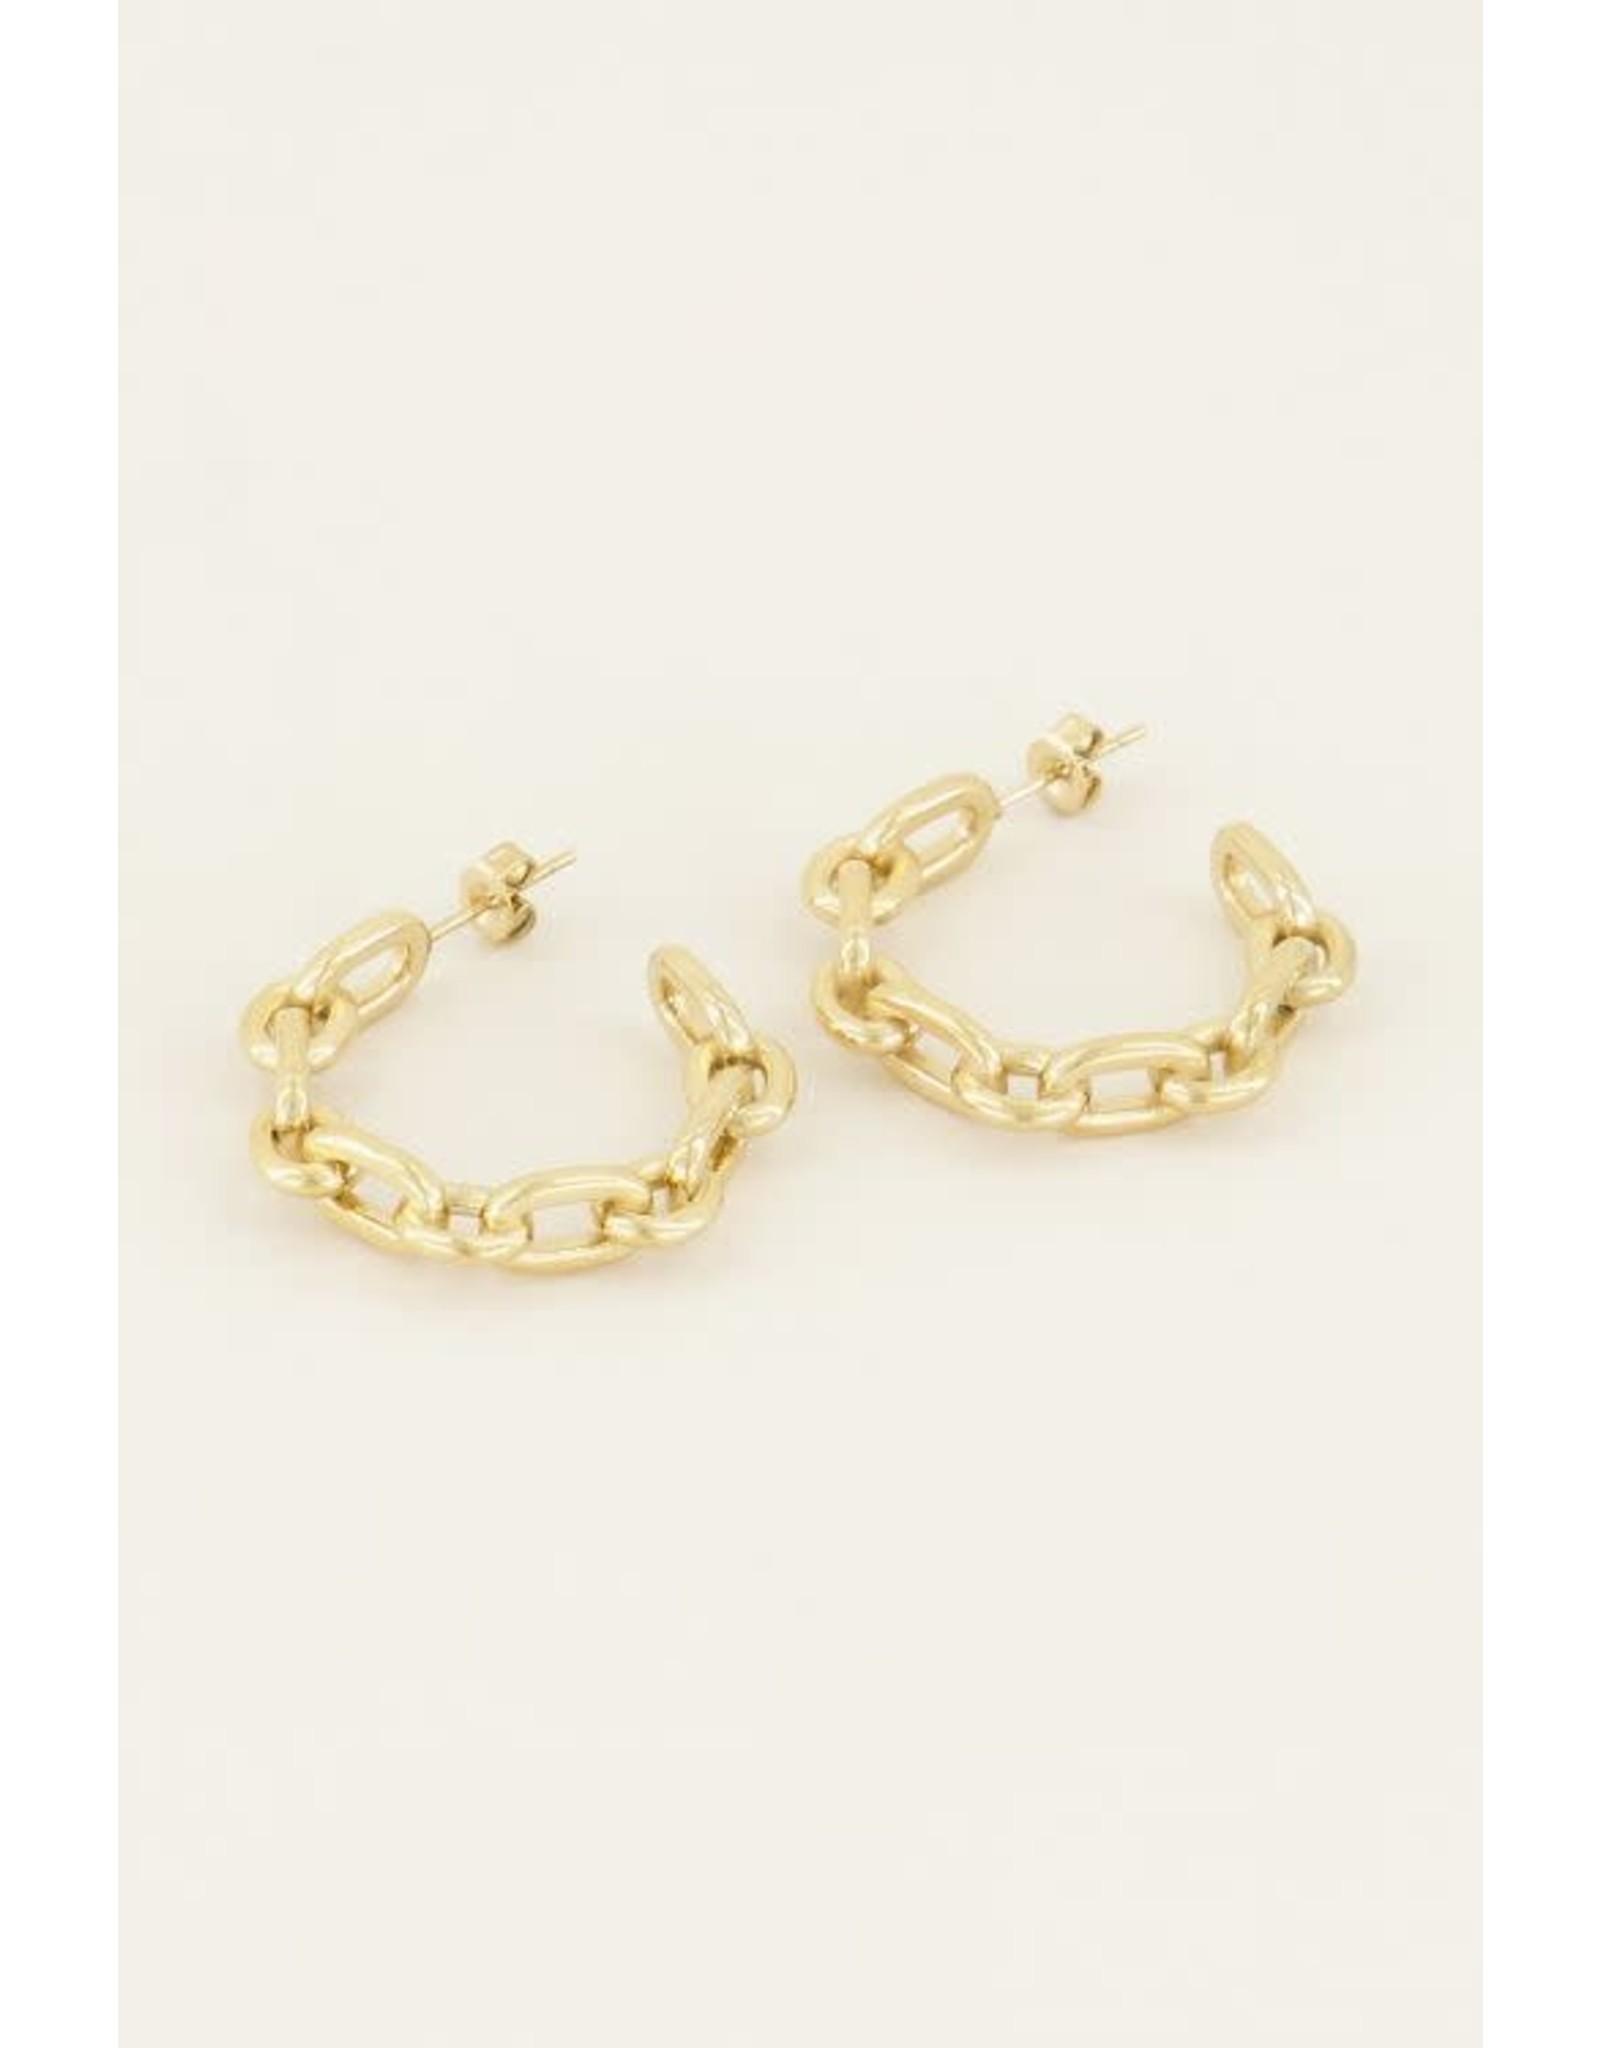 My Jewellery My Jewellery oorring grove schakel